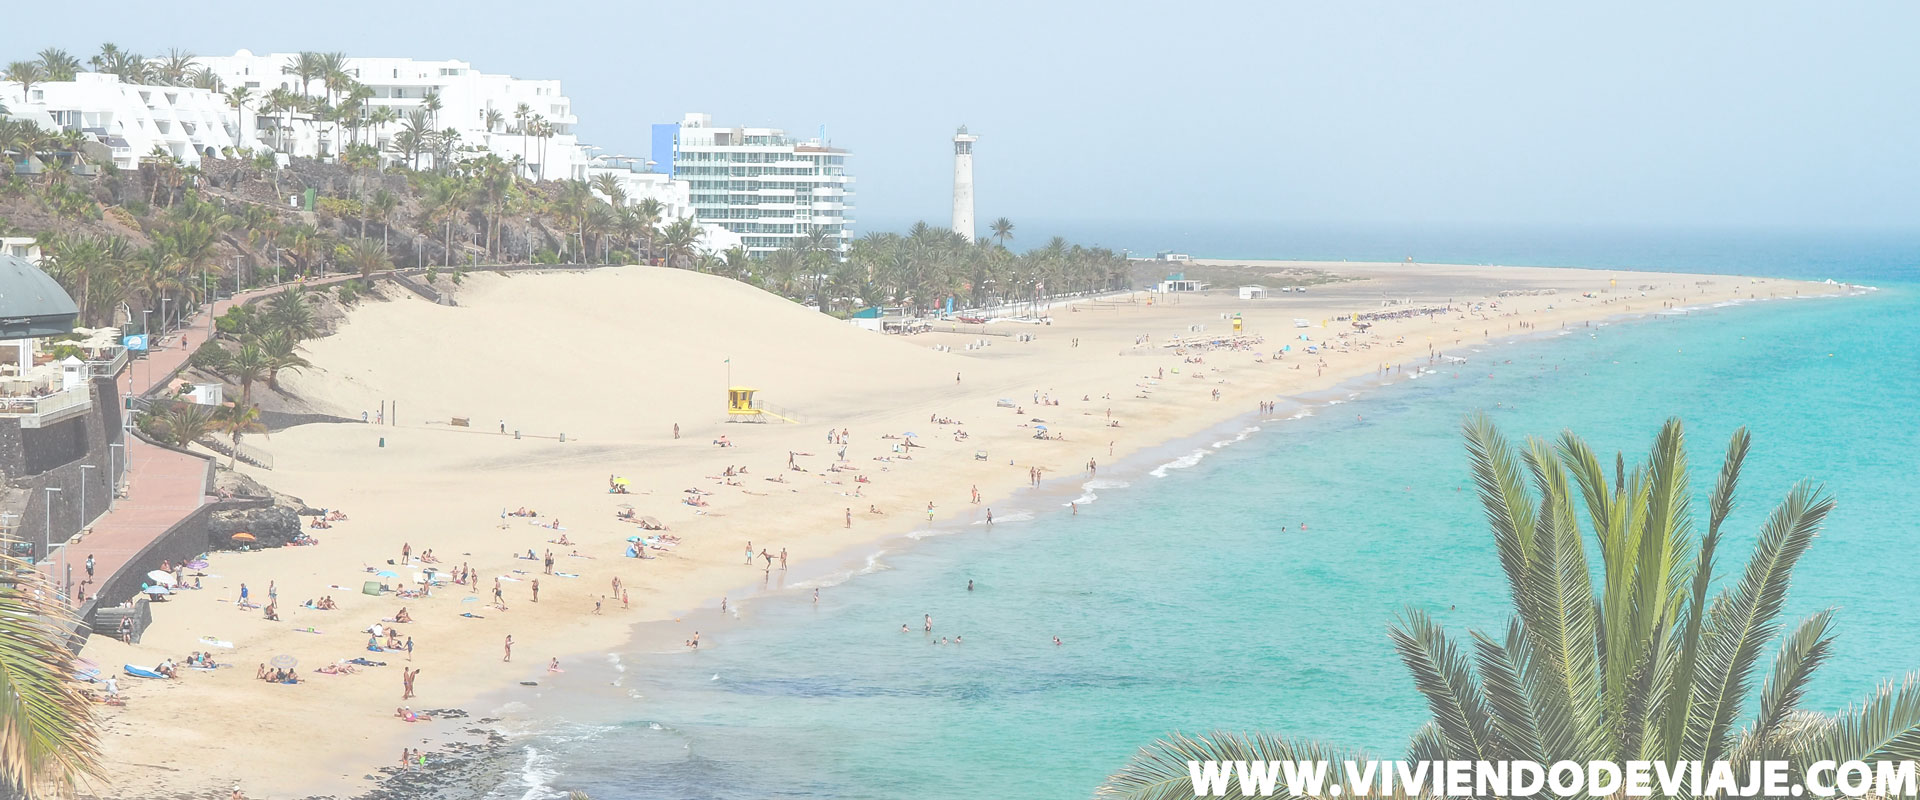 Zonas donde alojarse en Fuerteventura